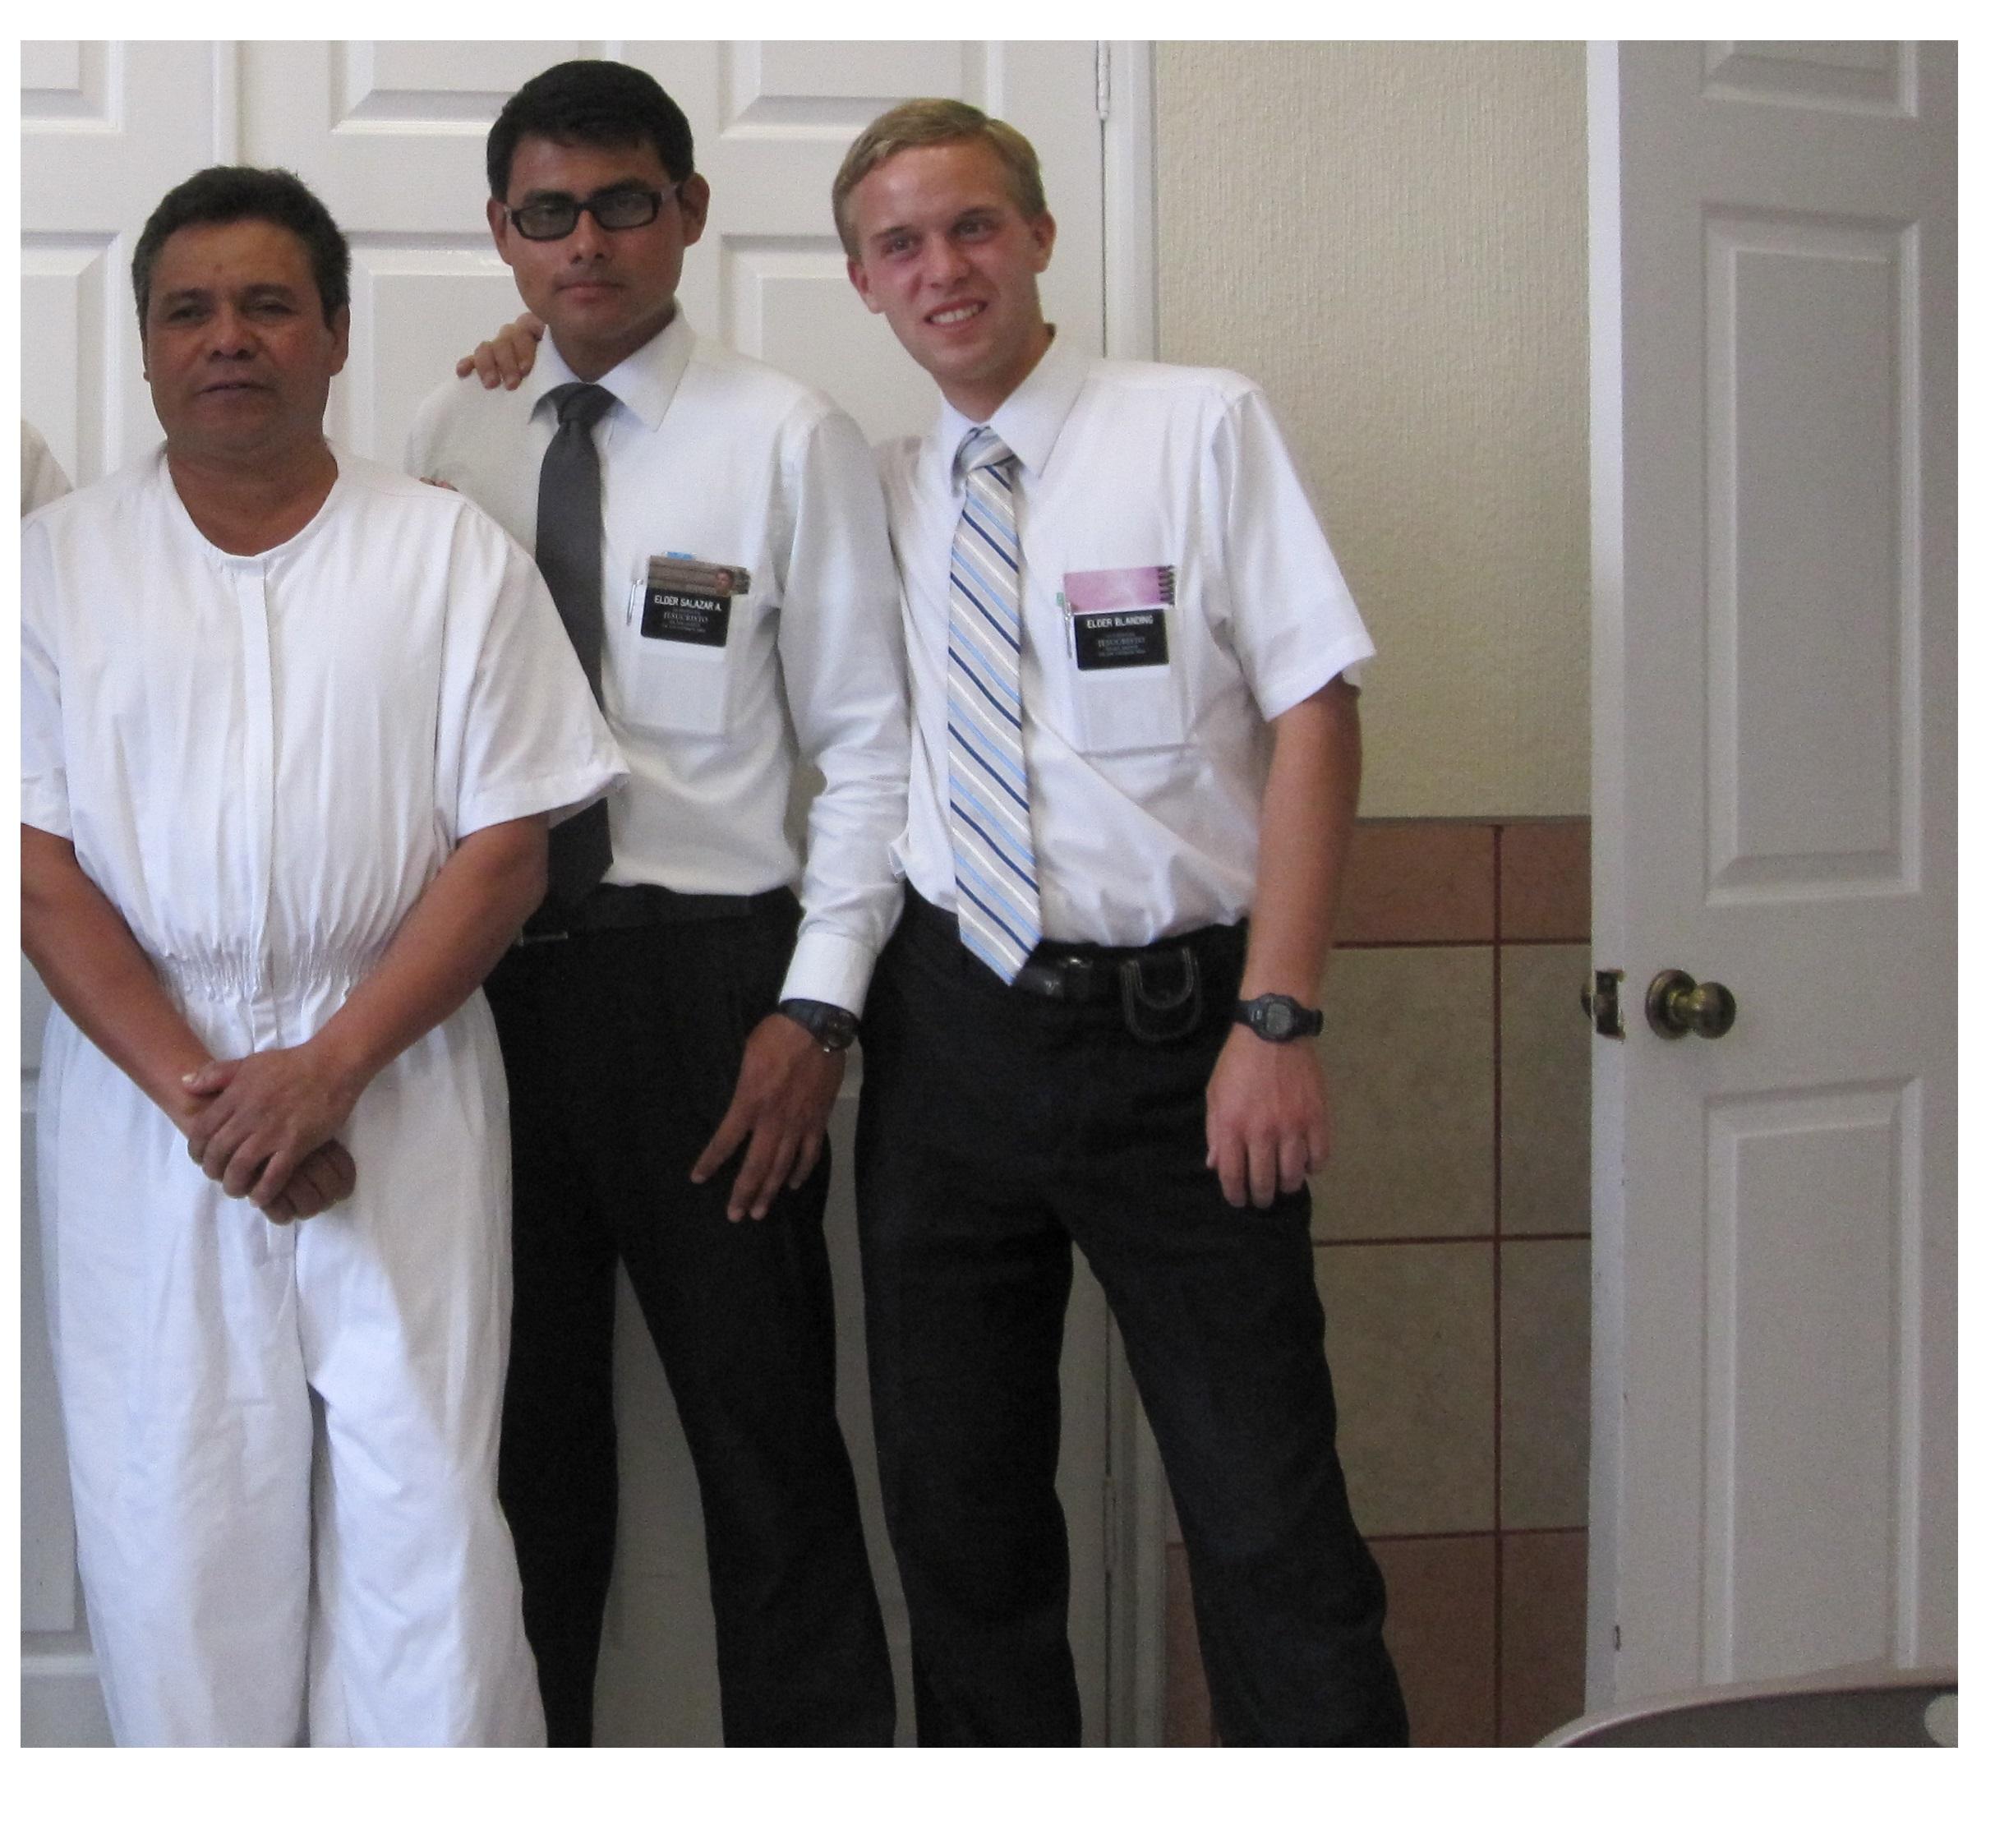 Elder Jason Blanding, far right